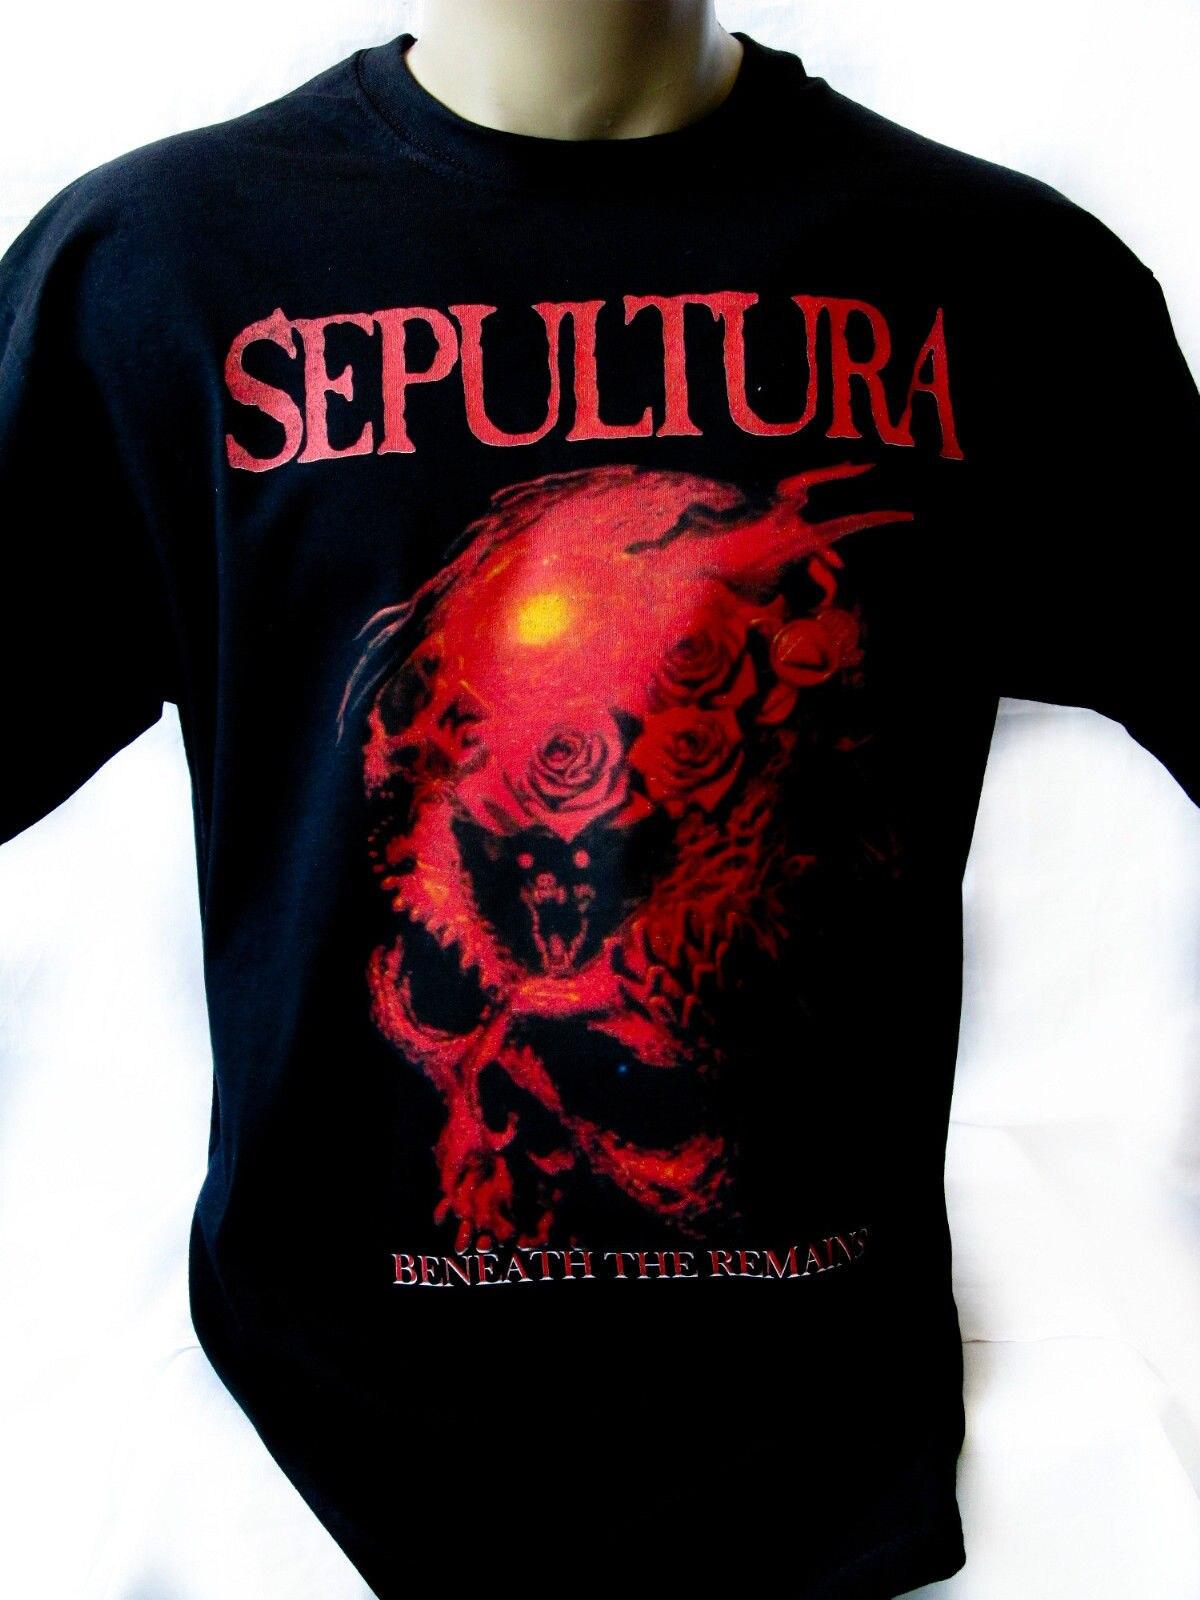 SEPULTURA BENEATH THE REMAINS 1989 Black T shirt Men Shirt Rock Band Tee Music  Fashion T shirt